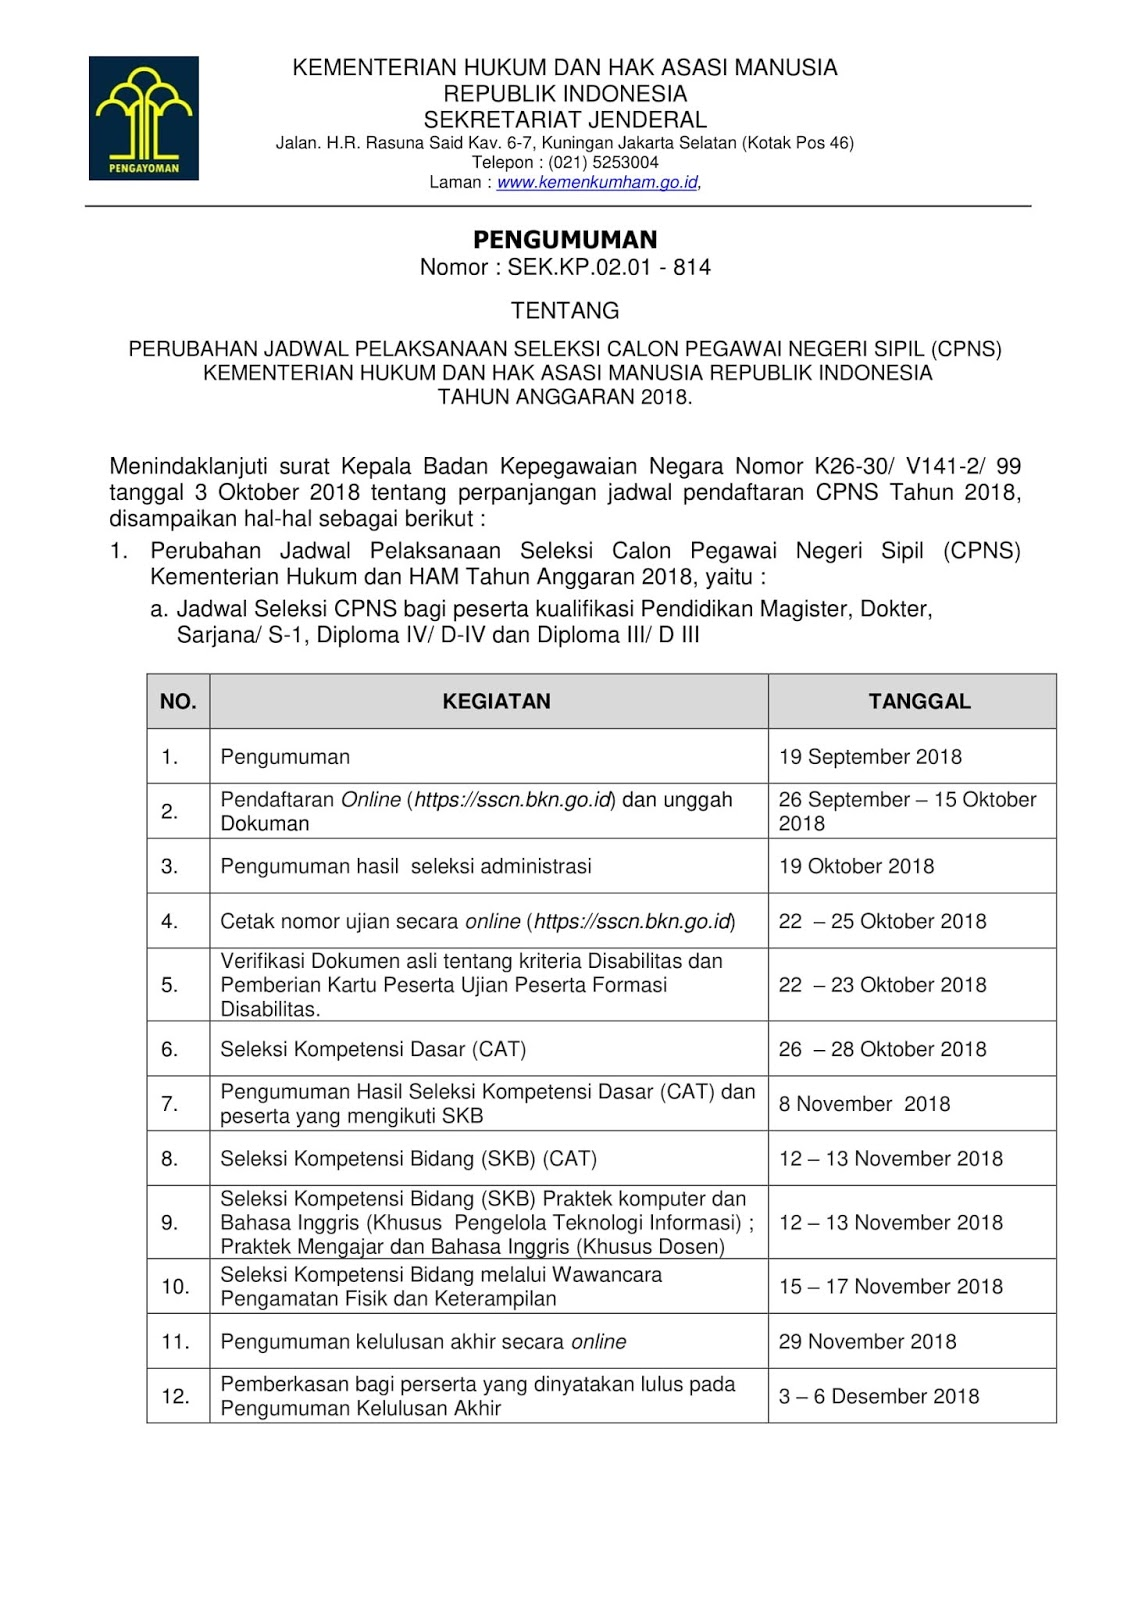 Pengumuman Resmi Perubahan Jadwal Pendaftaran Pelaksanaan CPNS Kemenkumham